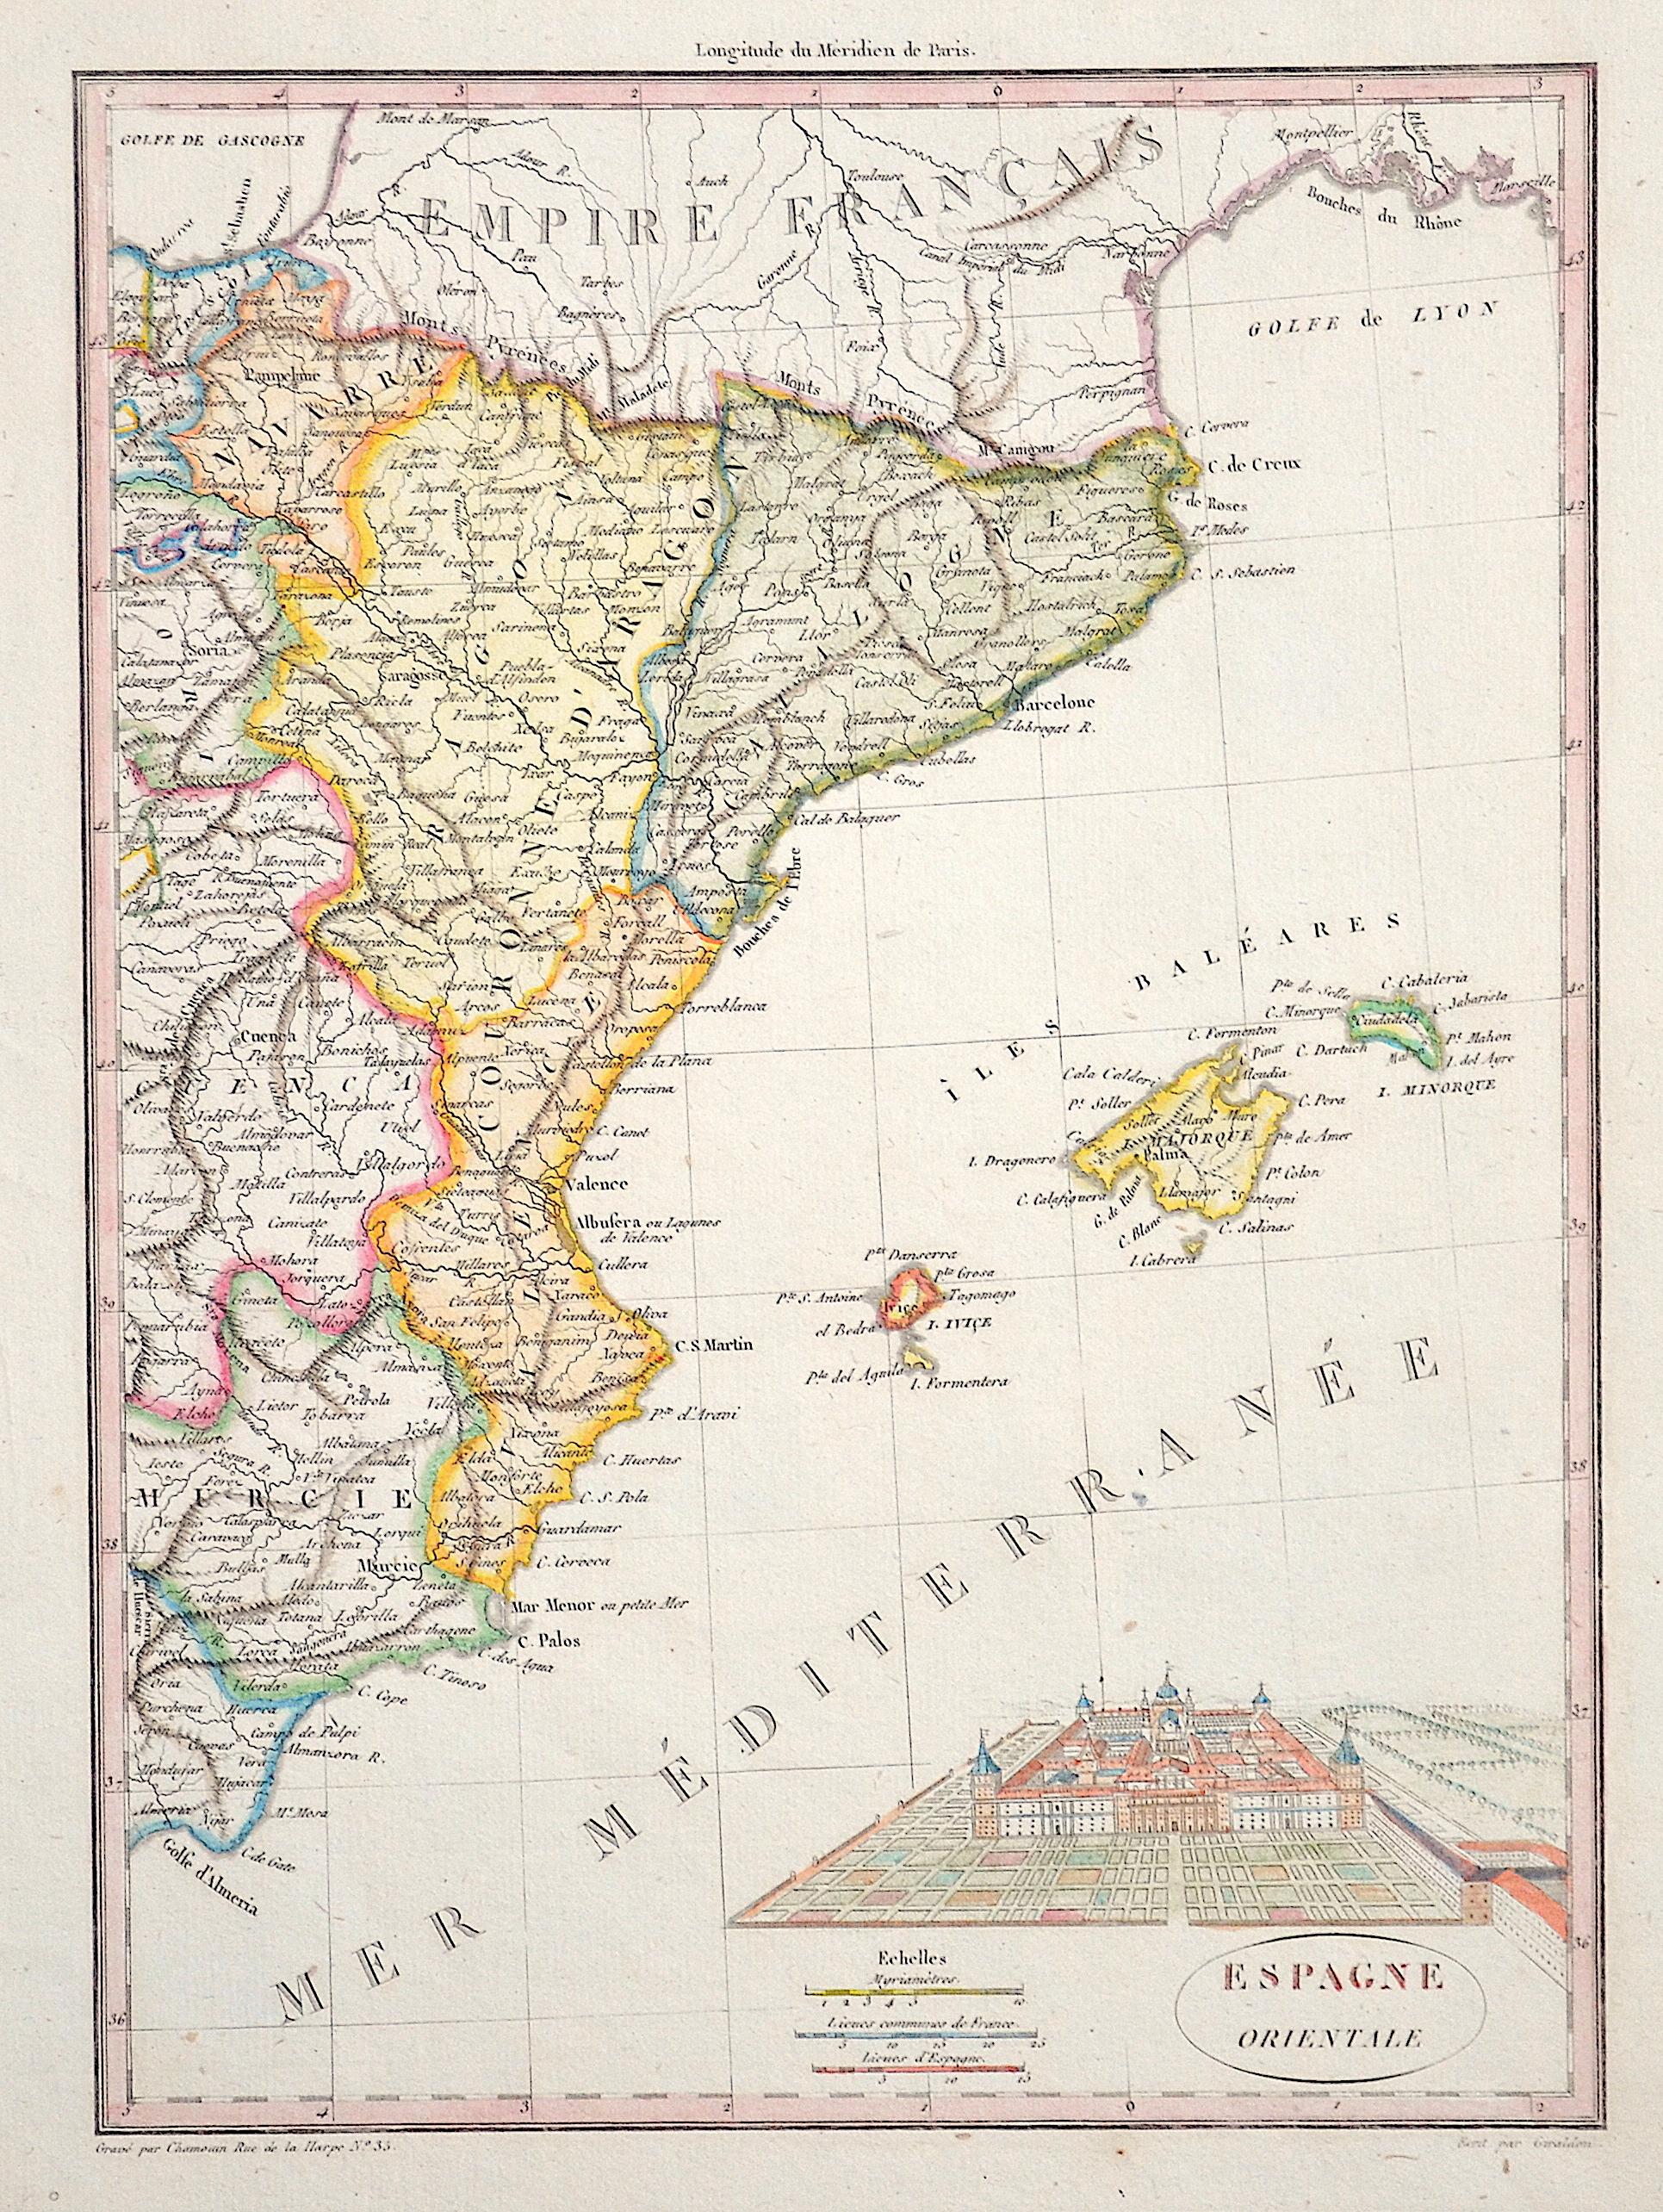 Giraldon  Espagne Orientale